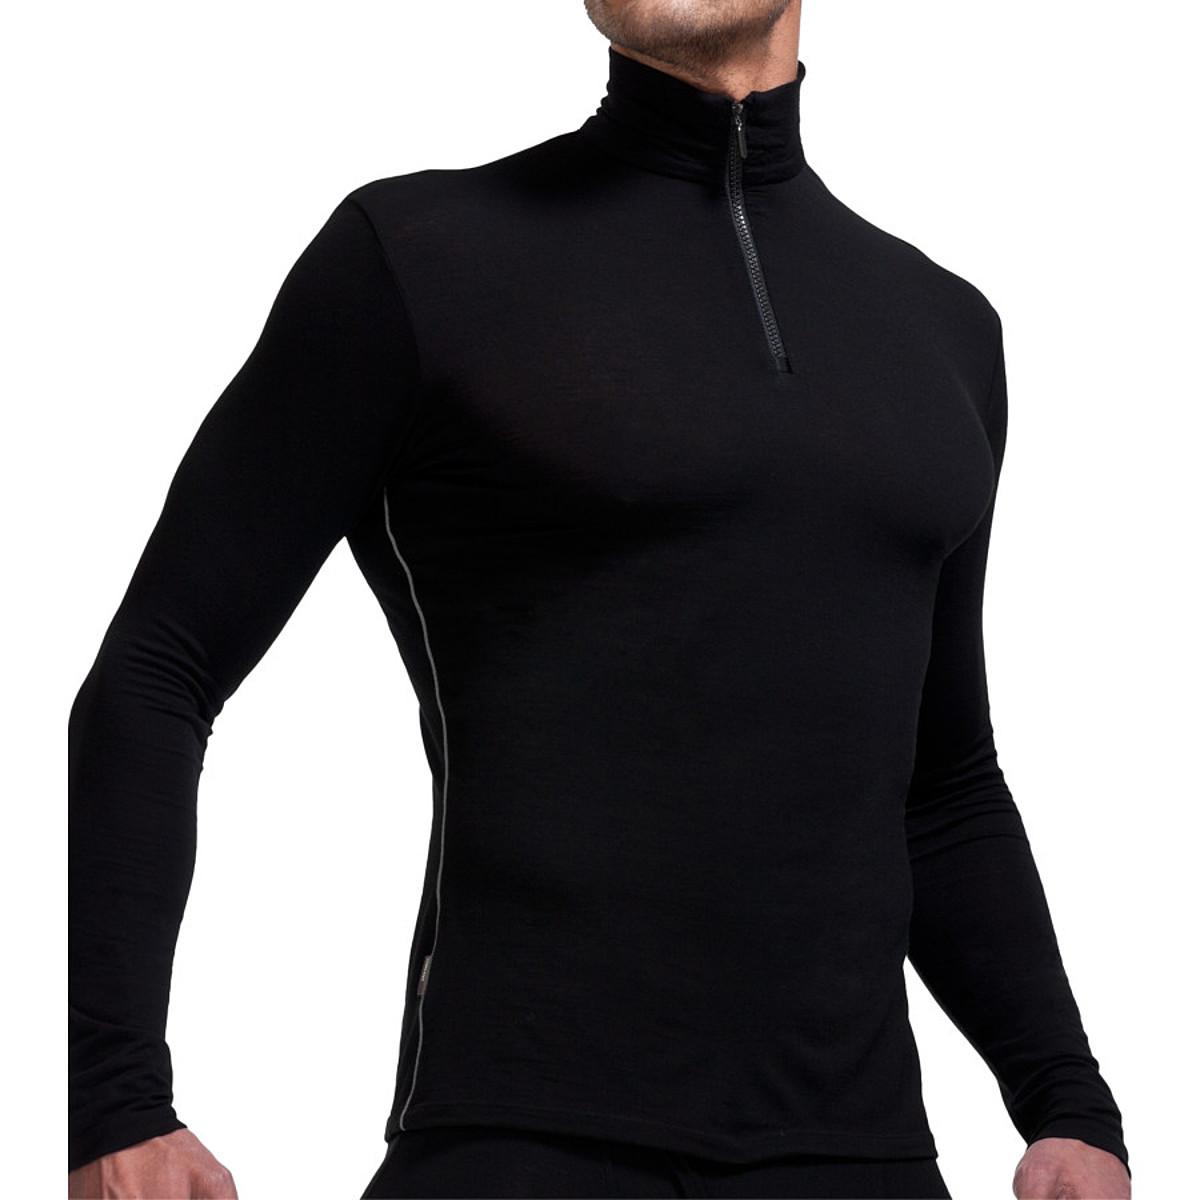 Icebreaker Anatomica Long Sleeve Half Zip